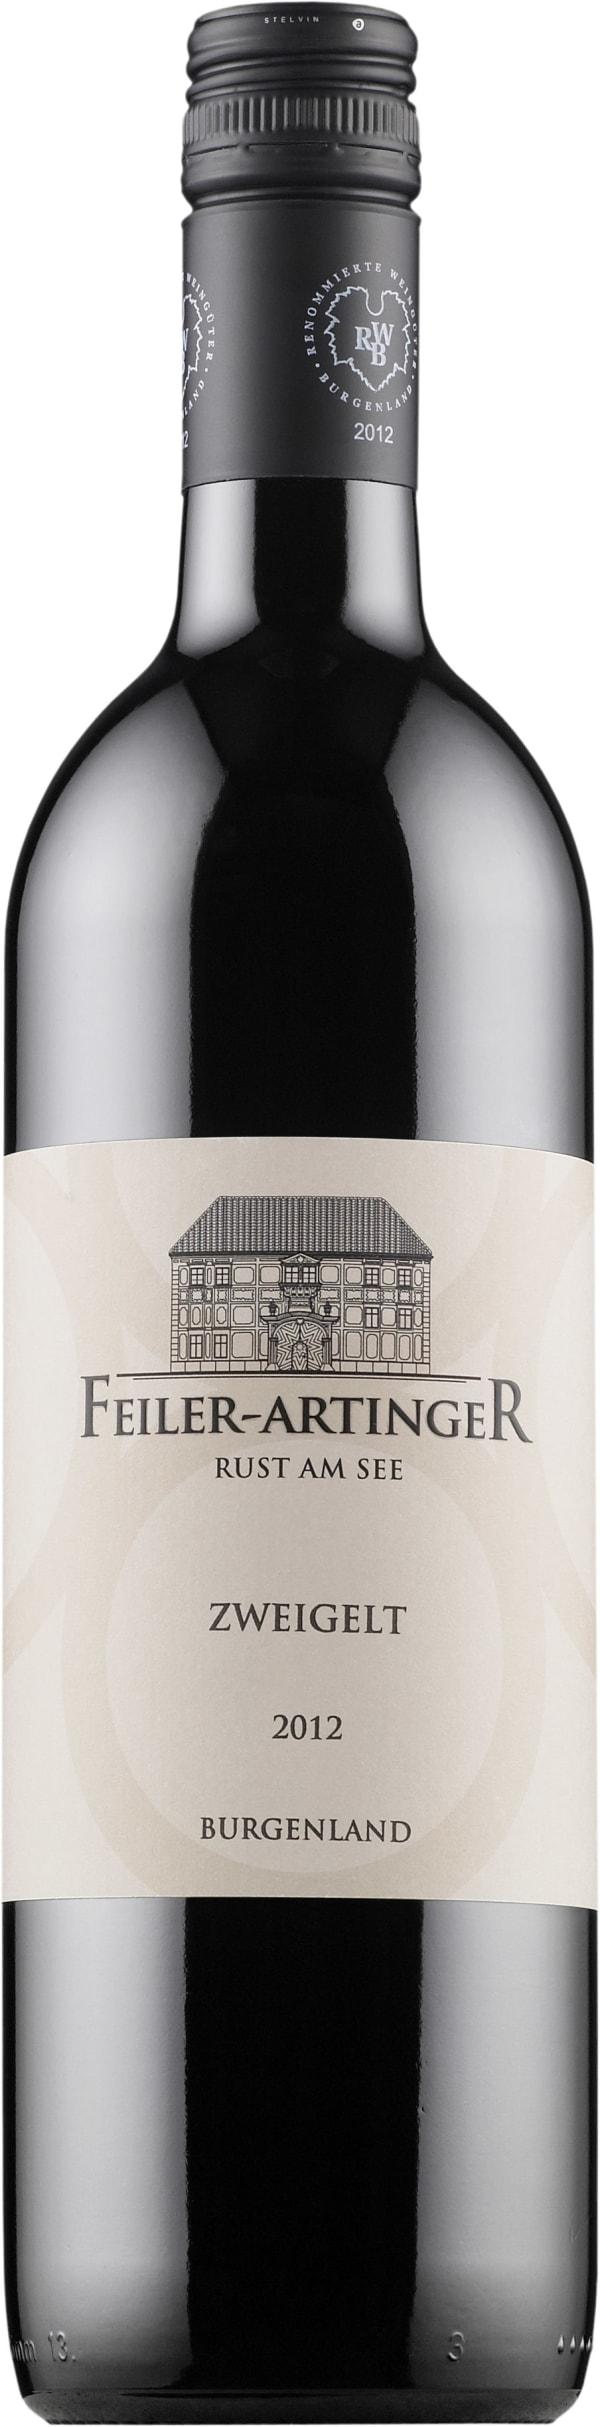 Feiler-Artinger Zweigelt 2015